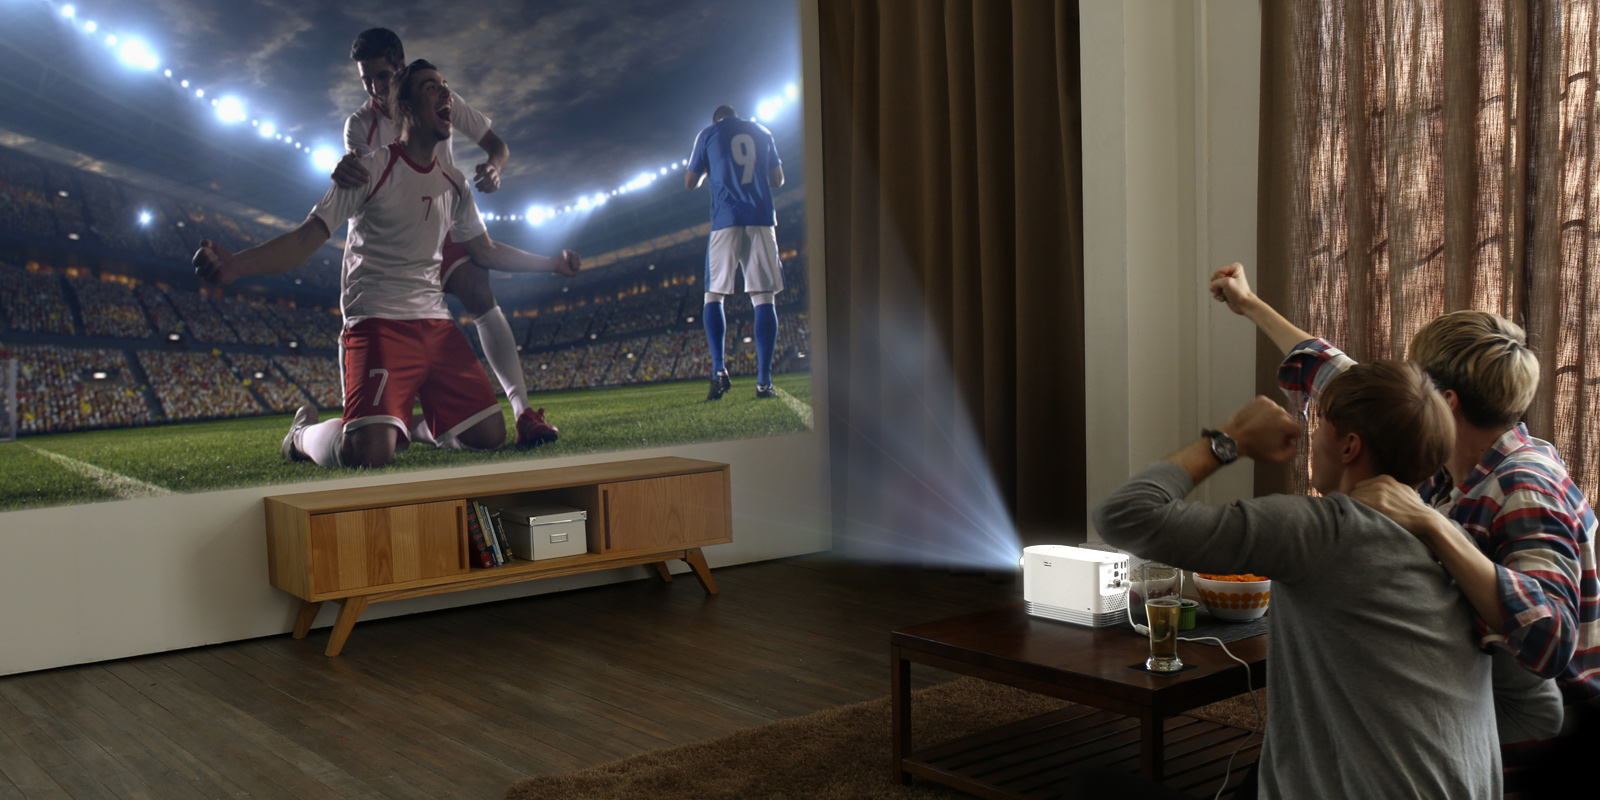 LG-ev laserski projektor